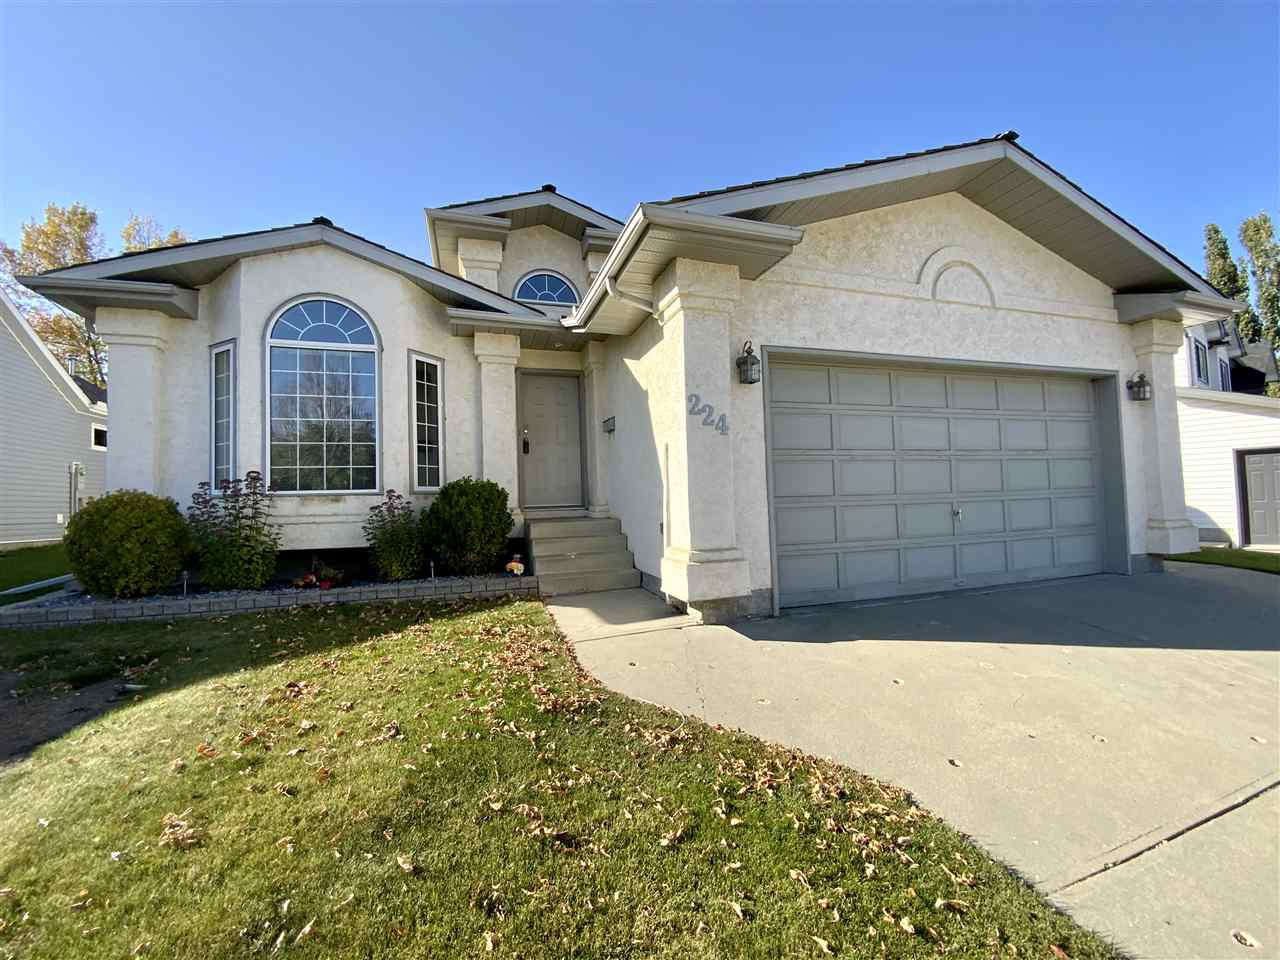 Main Photo: 224 Parkallen Way: Wetaskiwin House for sale : MLS®# E4216785